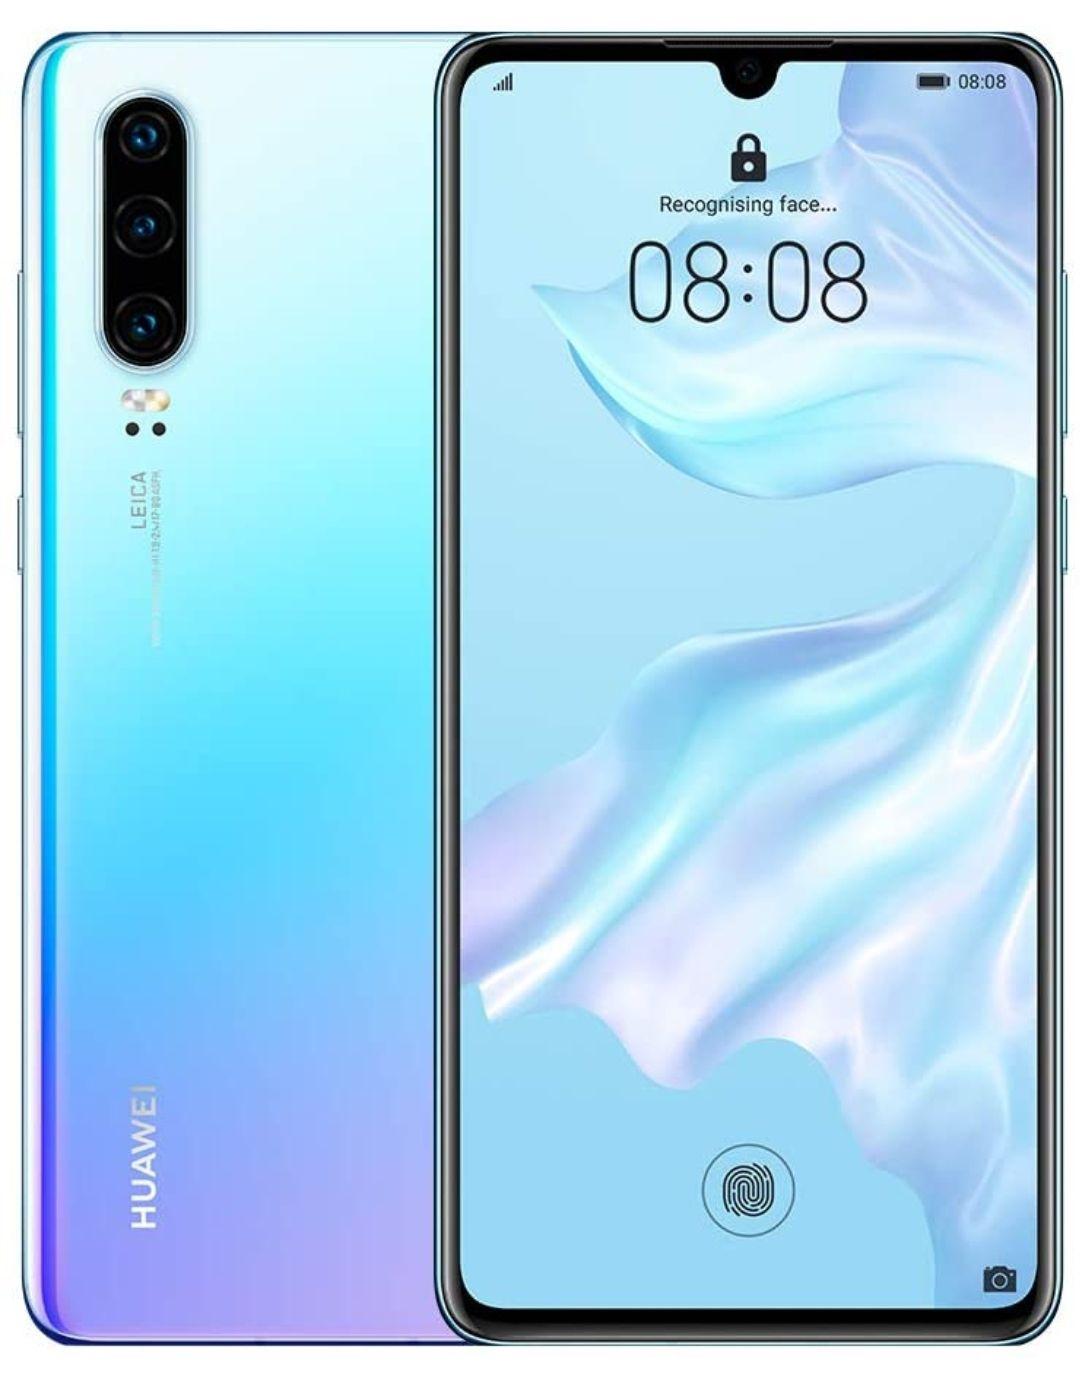 Huawei P30 Kirin 980 128GB Unlocked Smartphone Breathing Crystal / Aurora - Grade B Used Good - £132.99 @ Handtec / Ebay